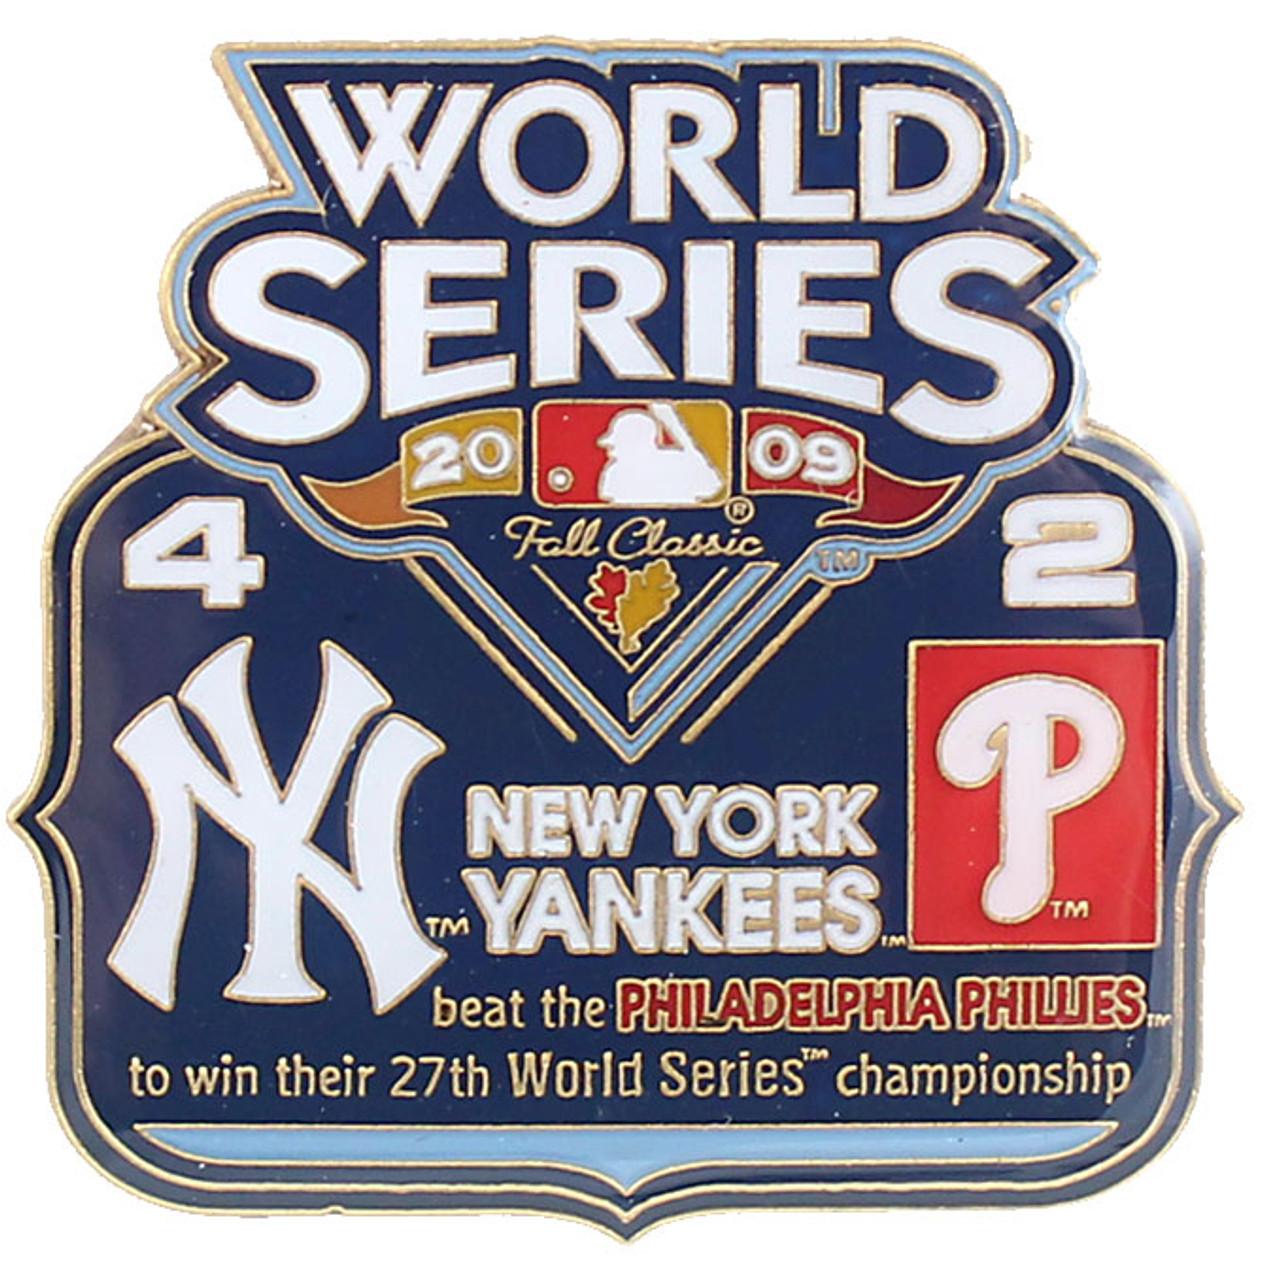 2009 World Series Commemorative Pin Yankees Vs Phillies